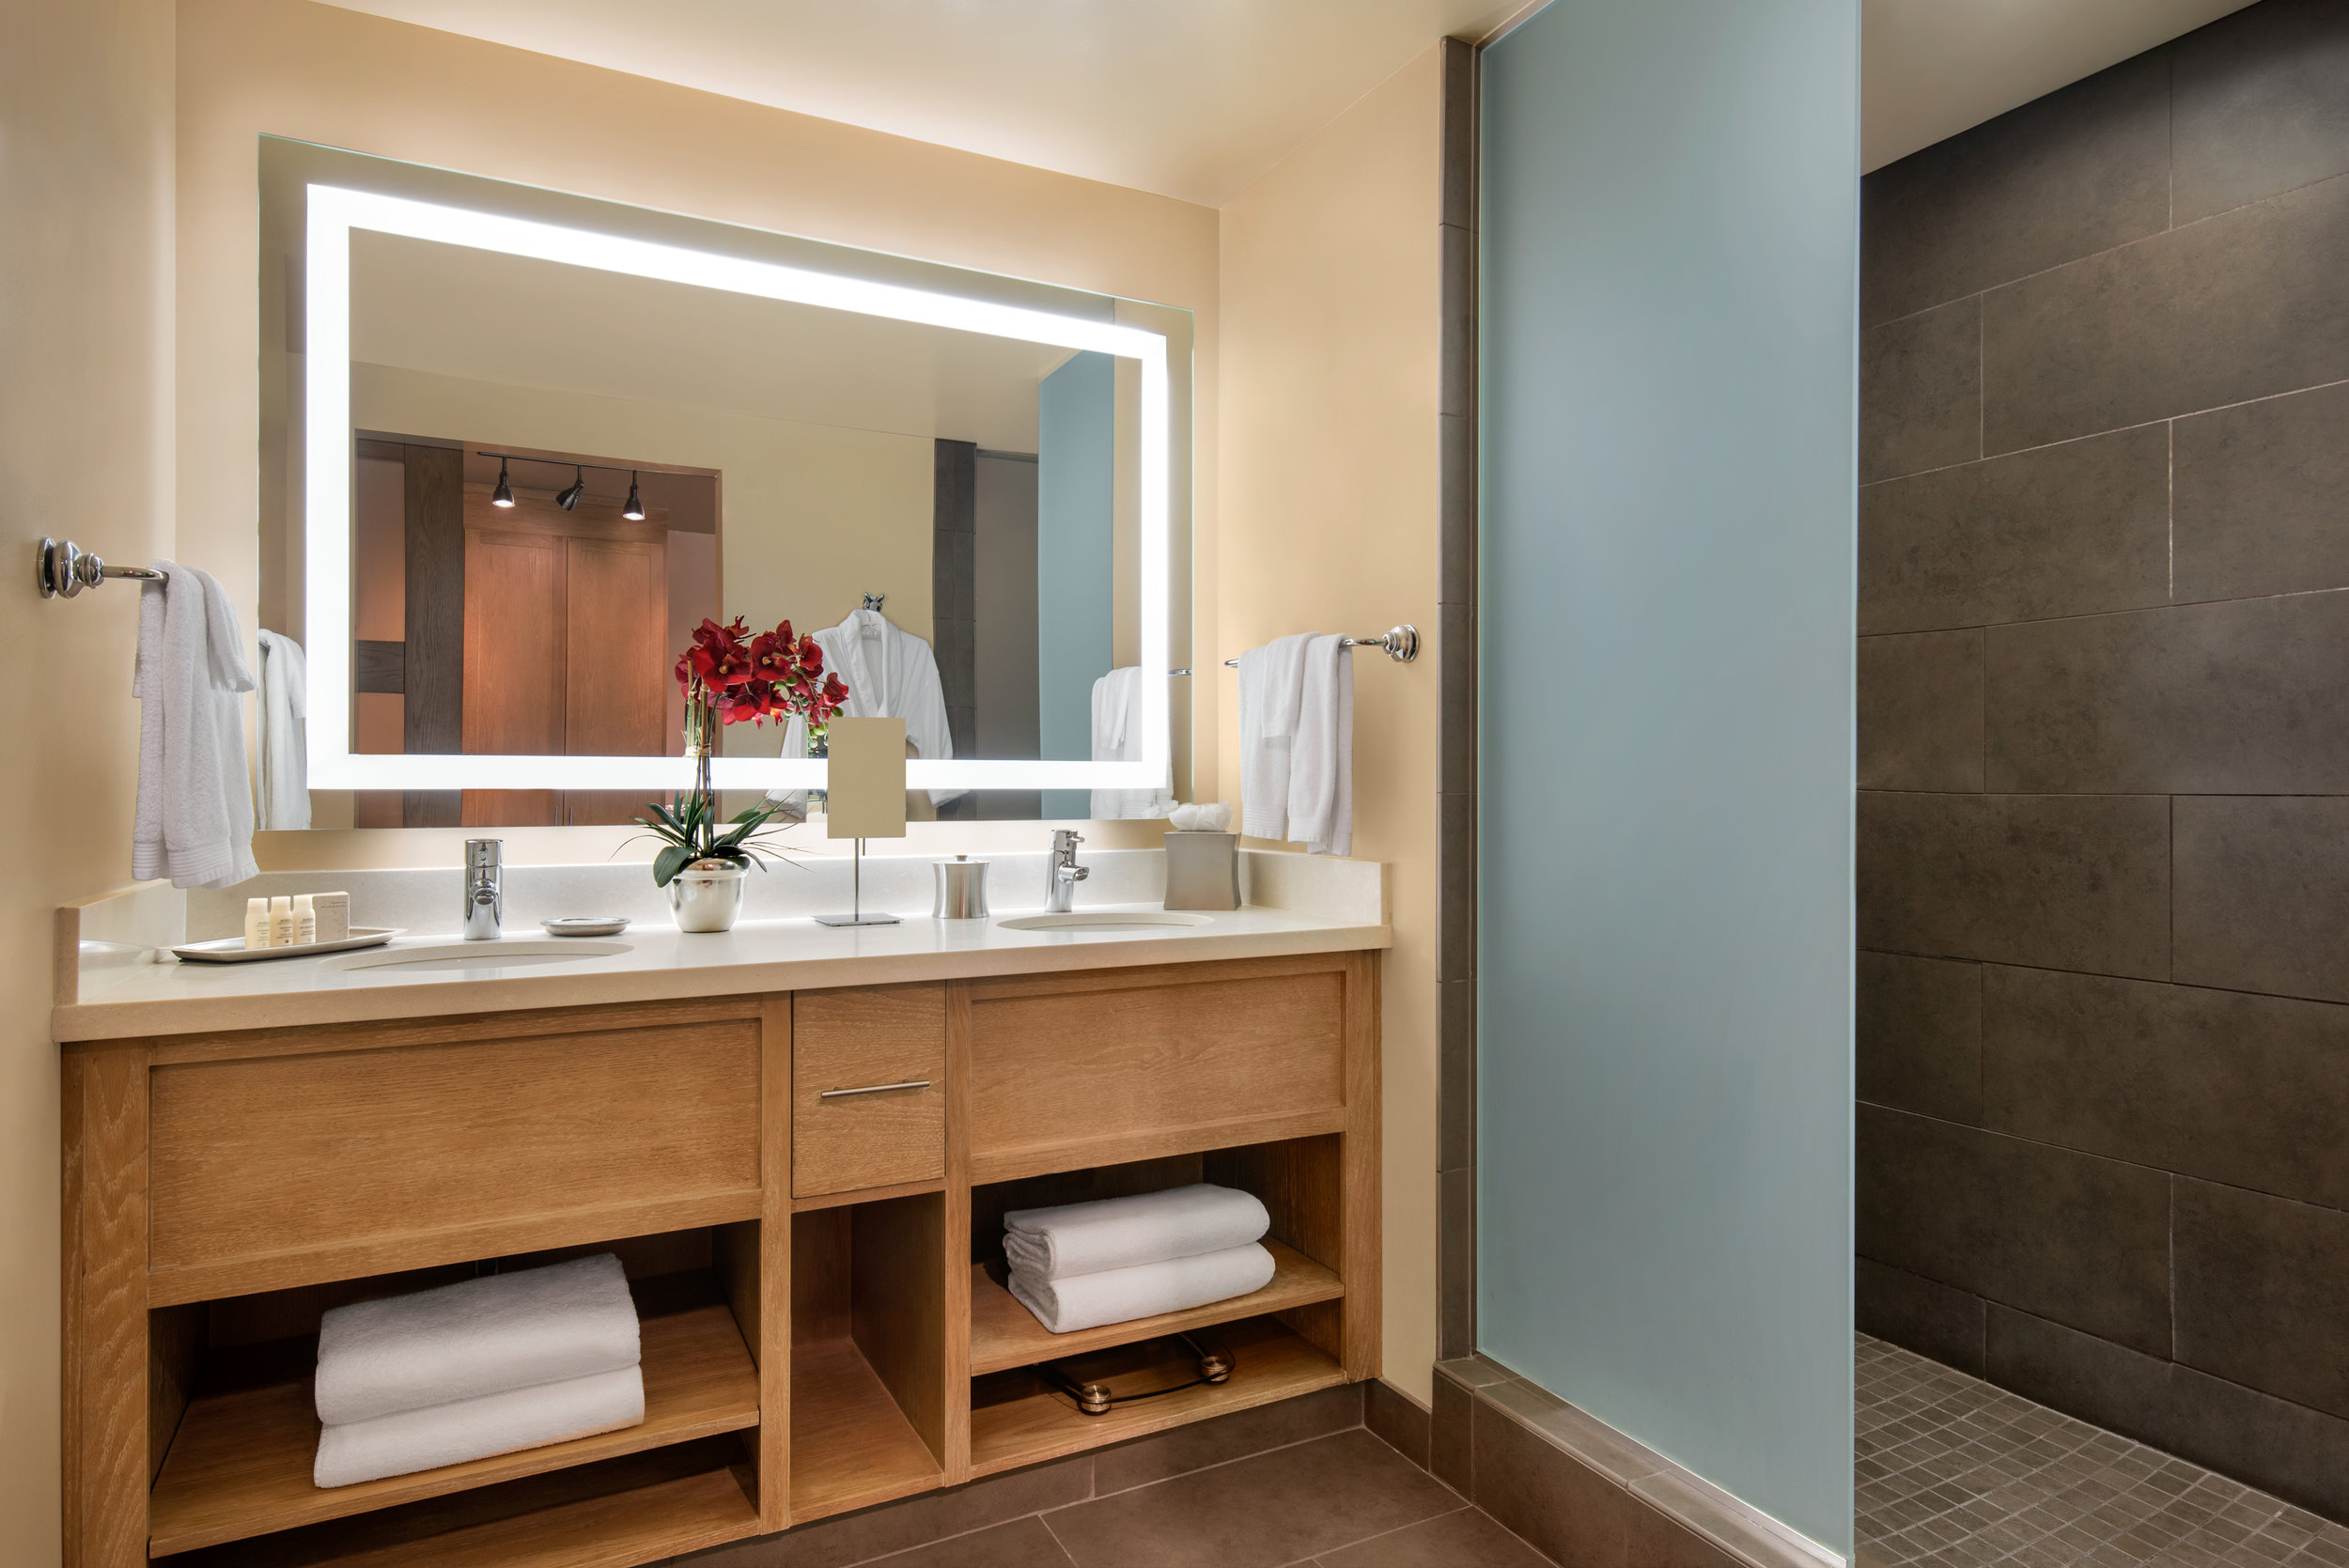 Inn_at_5th Suite Bathroom.jpg